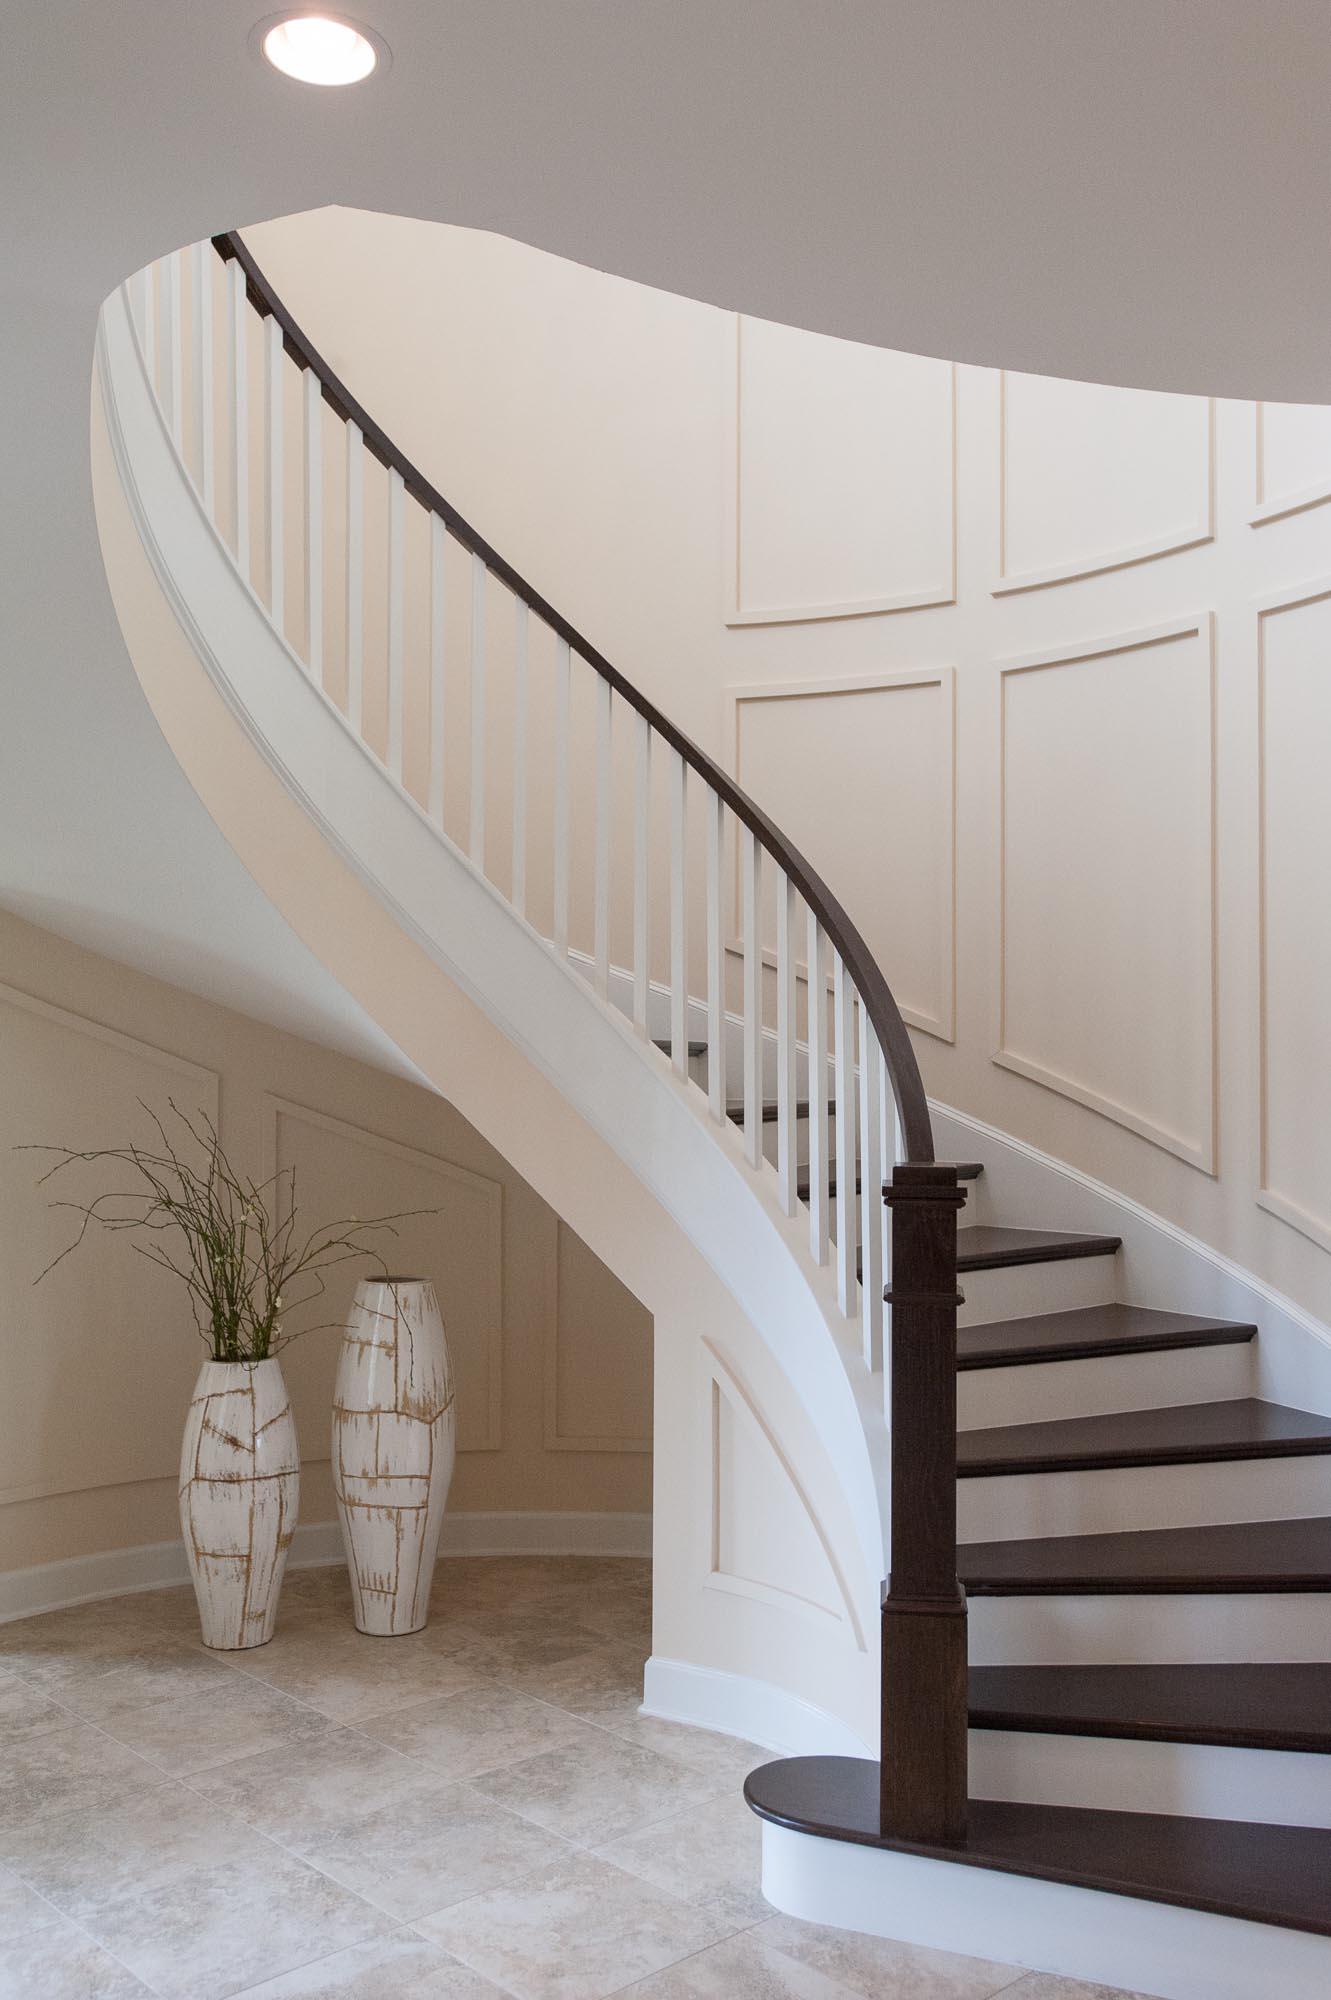 sterling-lennar-celestina-st johns-florida-nefba-northeast florida-southeastern united states-residential interior design-entry-contemporary-staircase-spiral staircase-millwork-planter.jpg